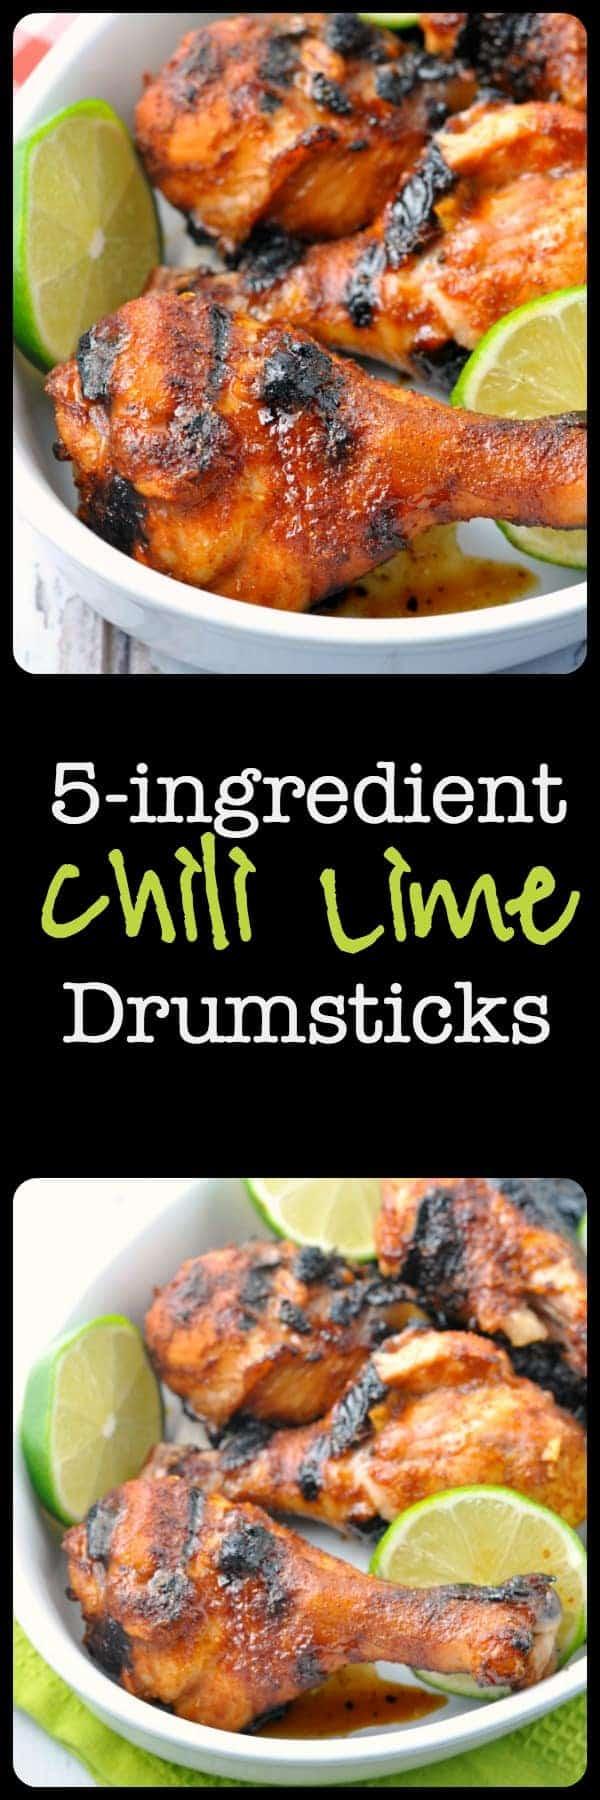 Paleo 5-Ingredinet Chili Lime Drumsticks. Quick and easy: chili, lime, garlic, honey. |www.flavourandsavour.com